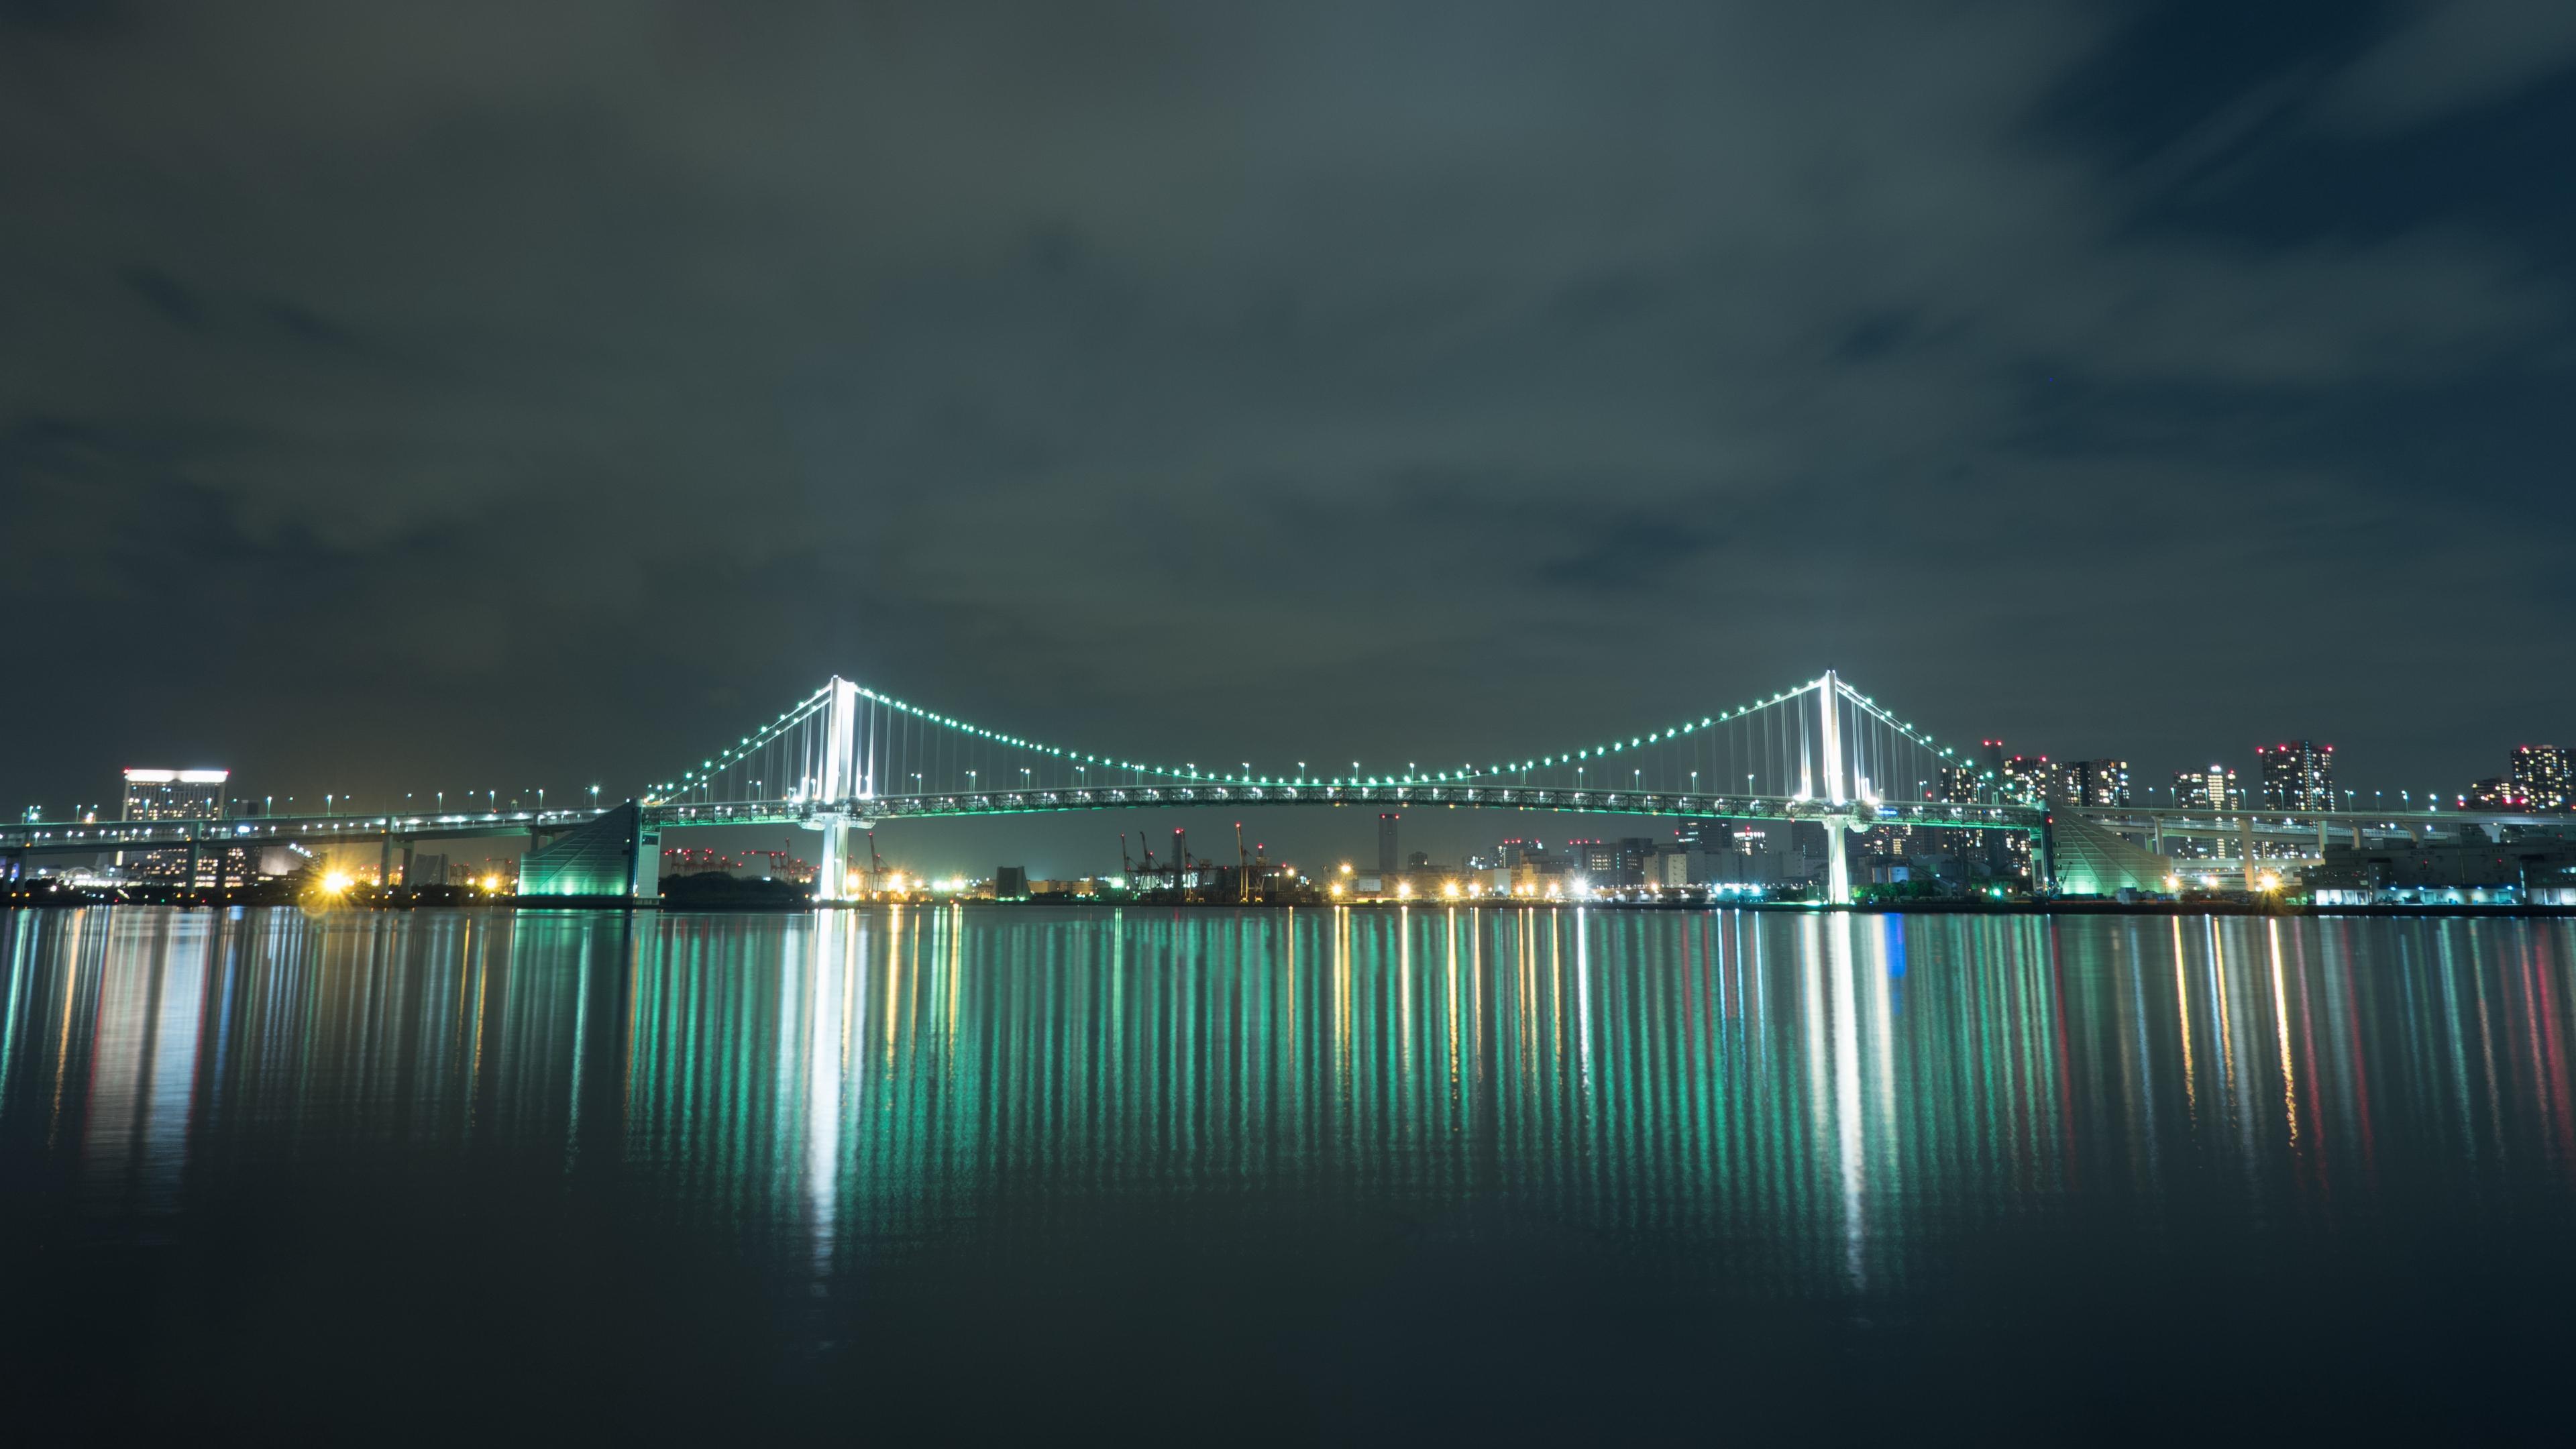 bridge night city lighting tokyo japan 4k 1538068094 - bridge, night city, lighting, tokyo, japan 4k - night city, Lighting, bridge